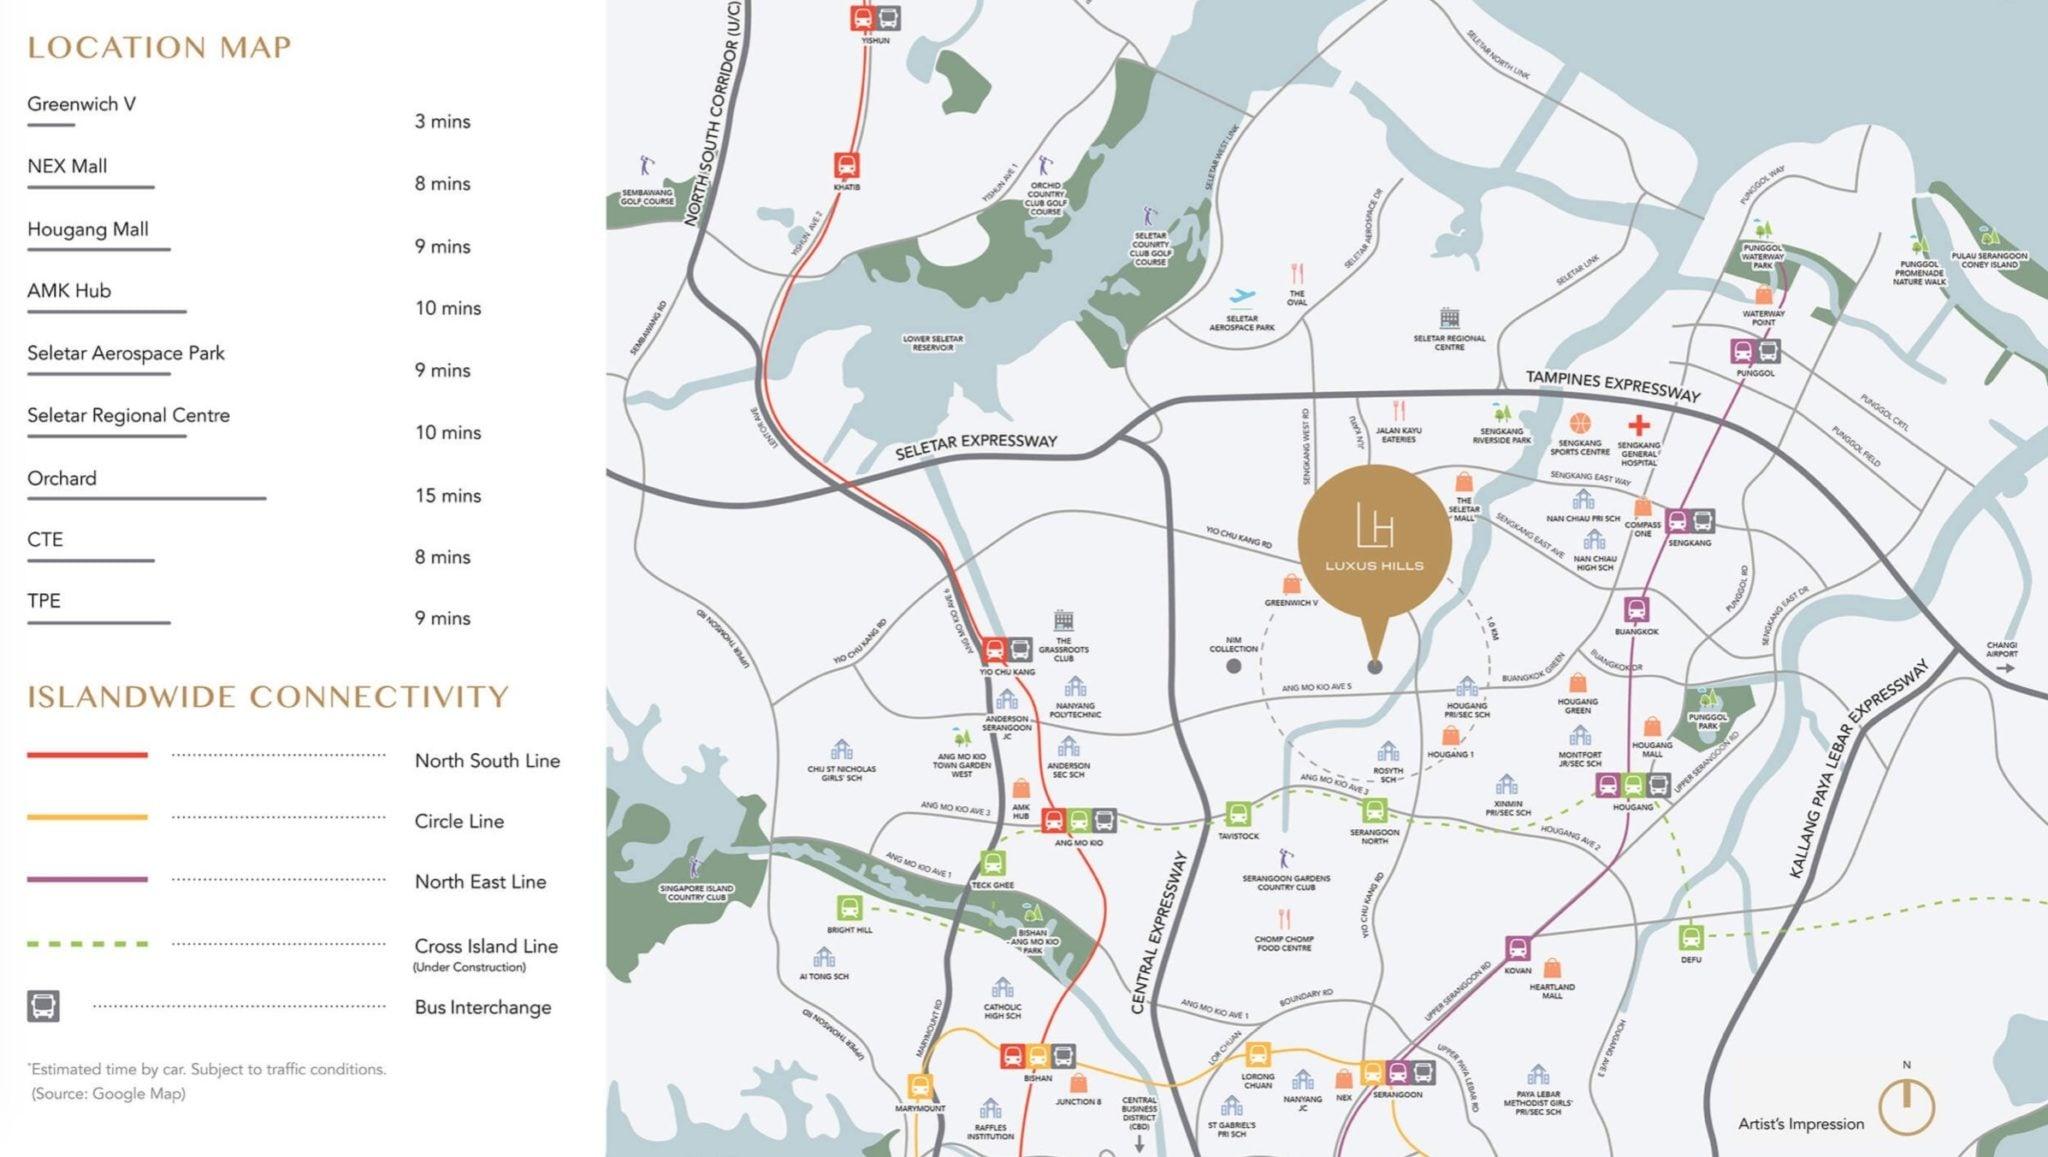 luxus-hills-bukit-sembawang-location map